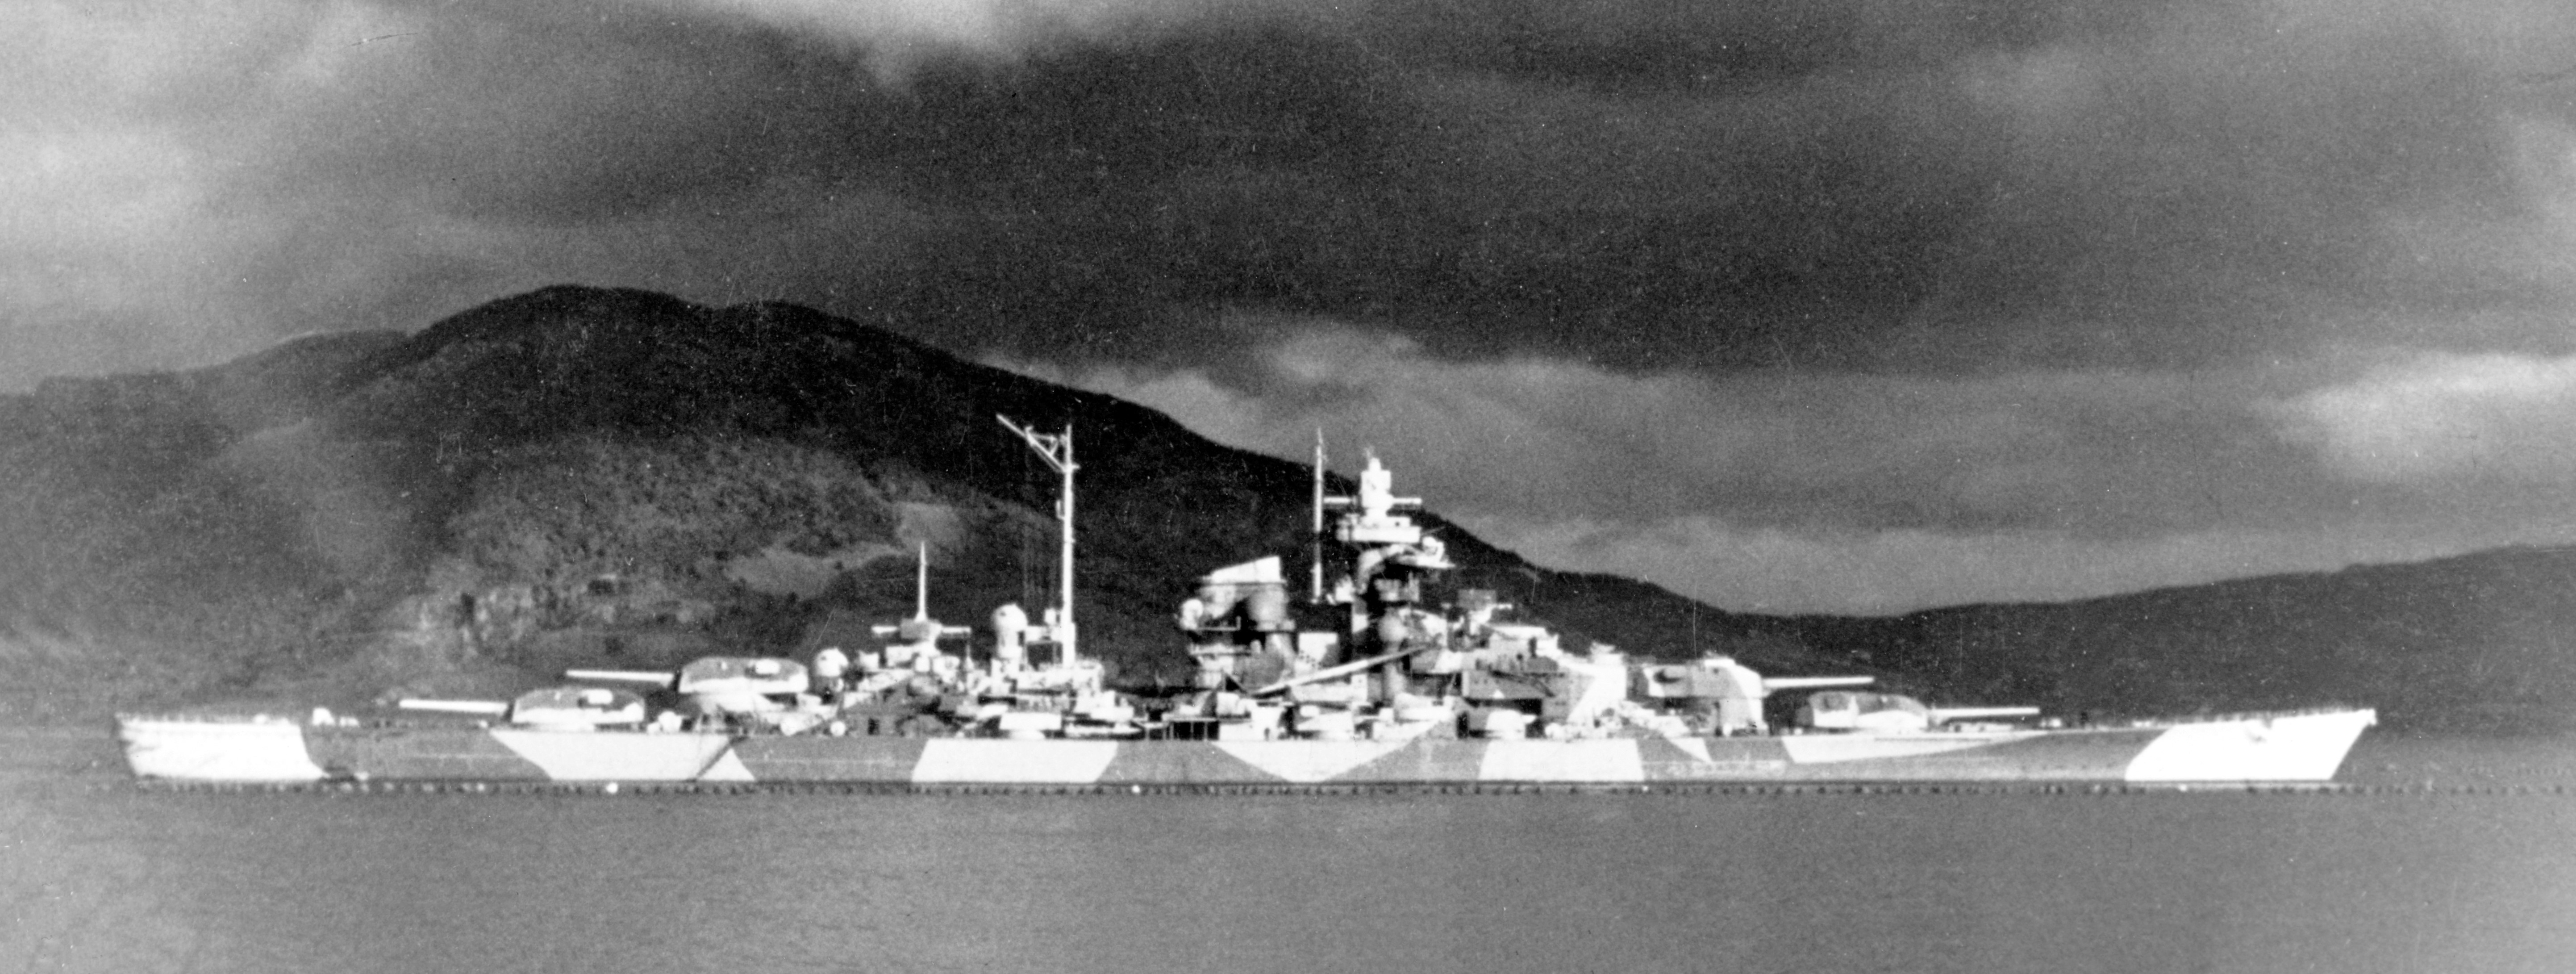 Image:Tirpitz altafjord.jpg